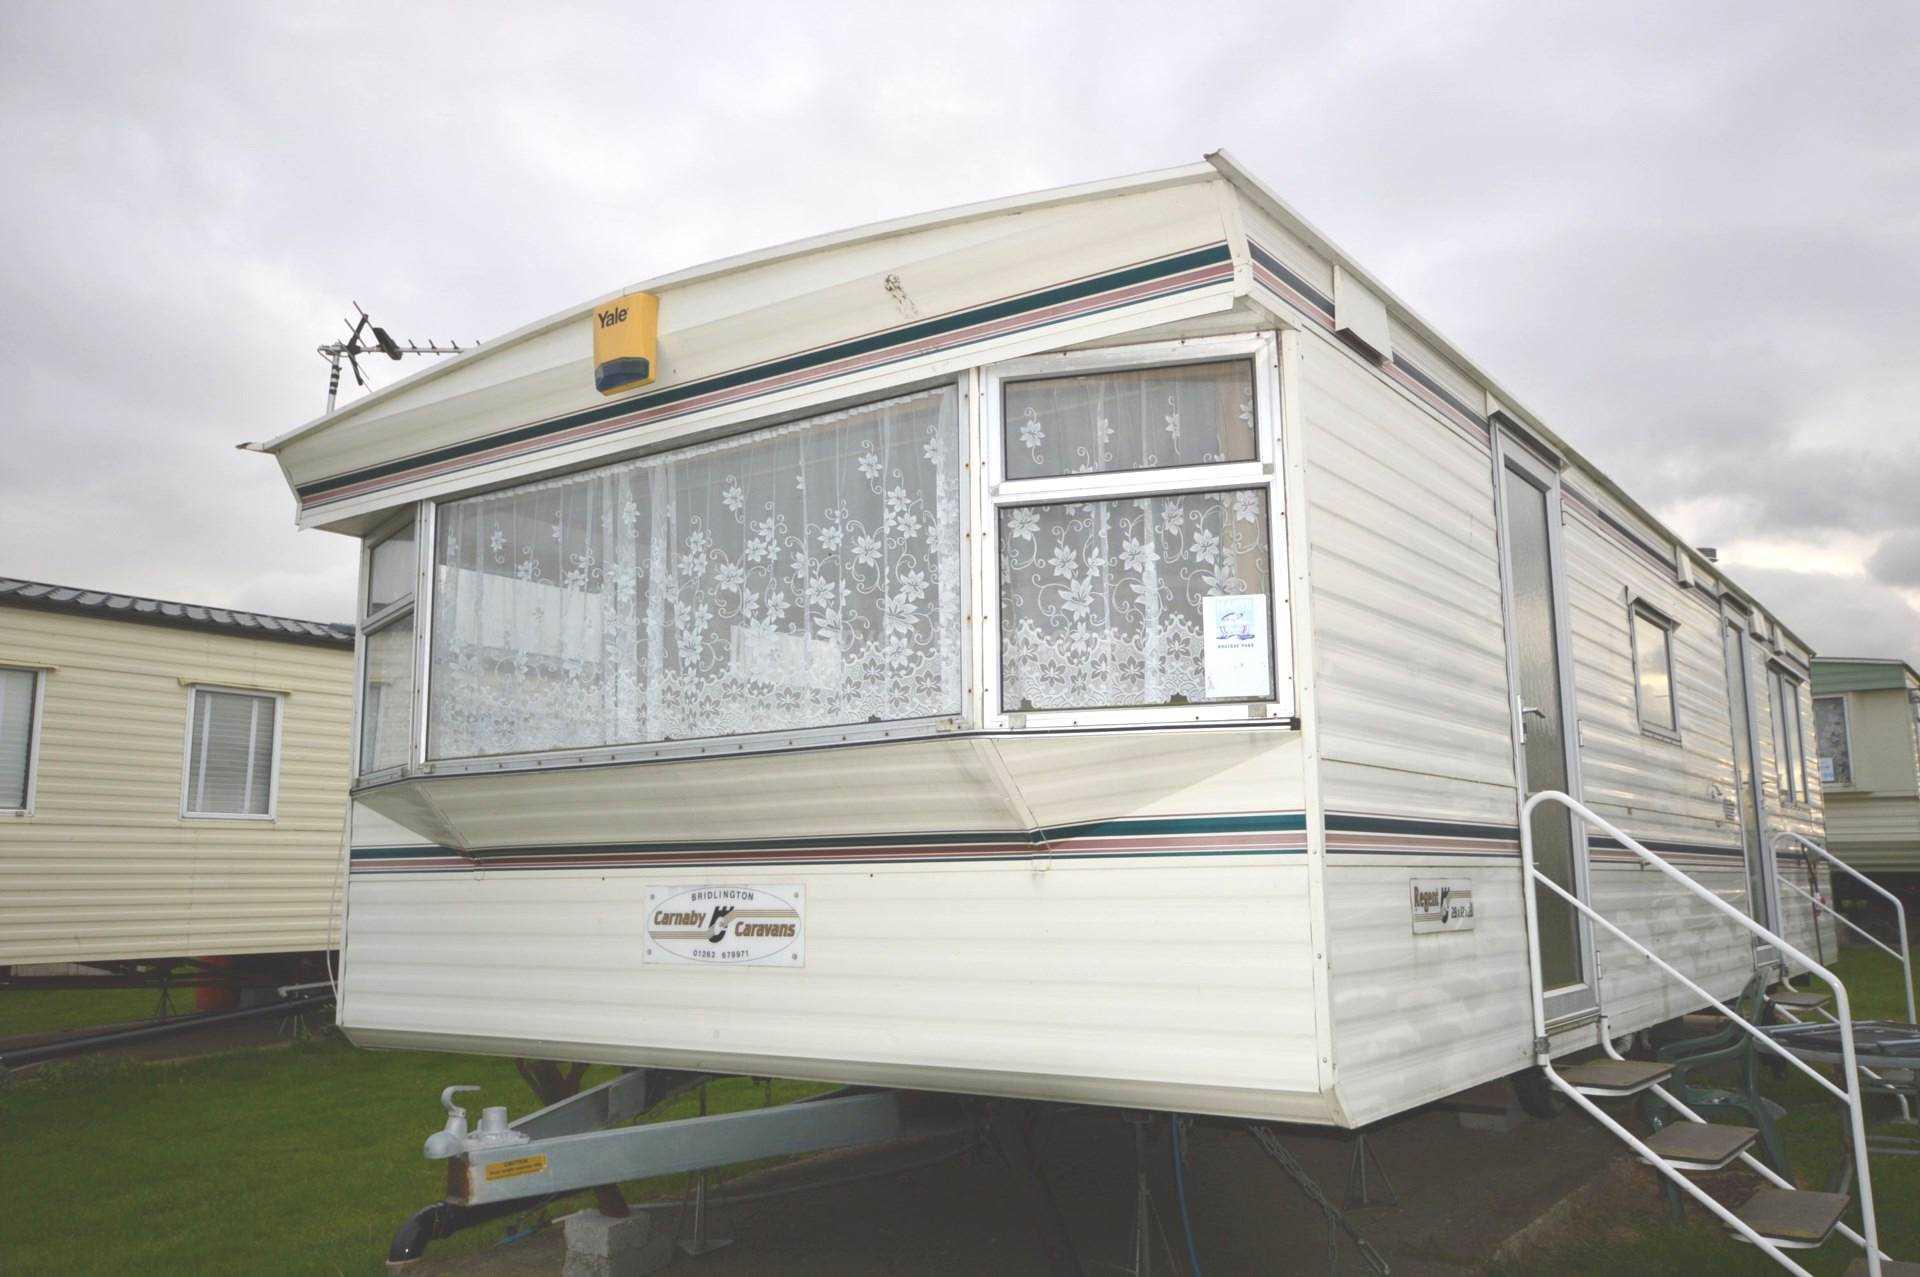 New Bedroom Caravan For Sale Harts Holiday Park Leysdown Road Leysdown